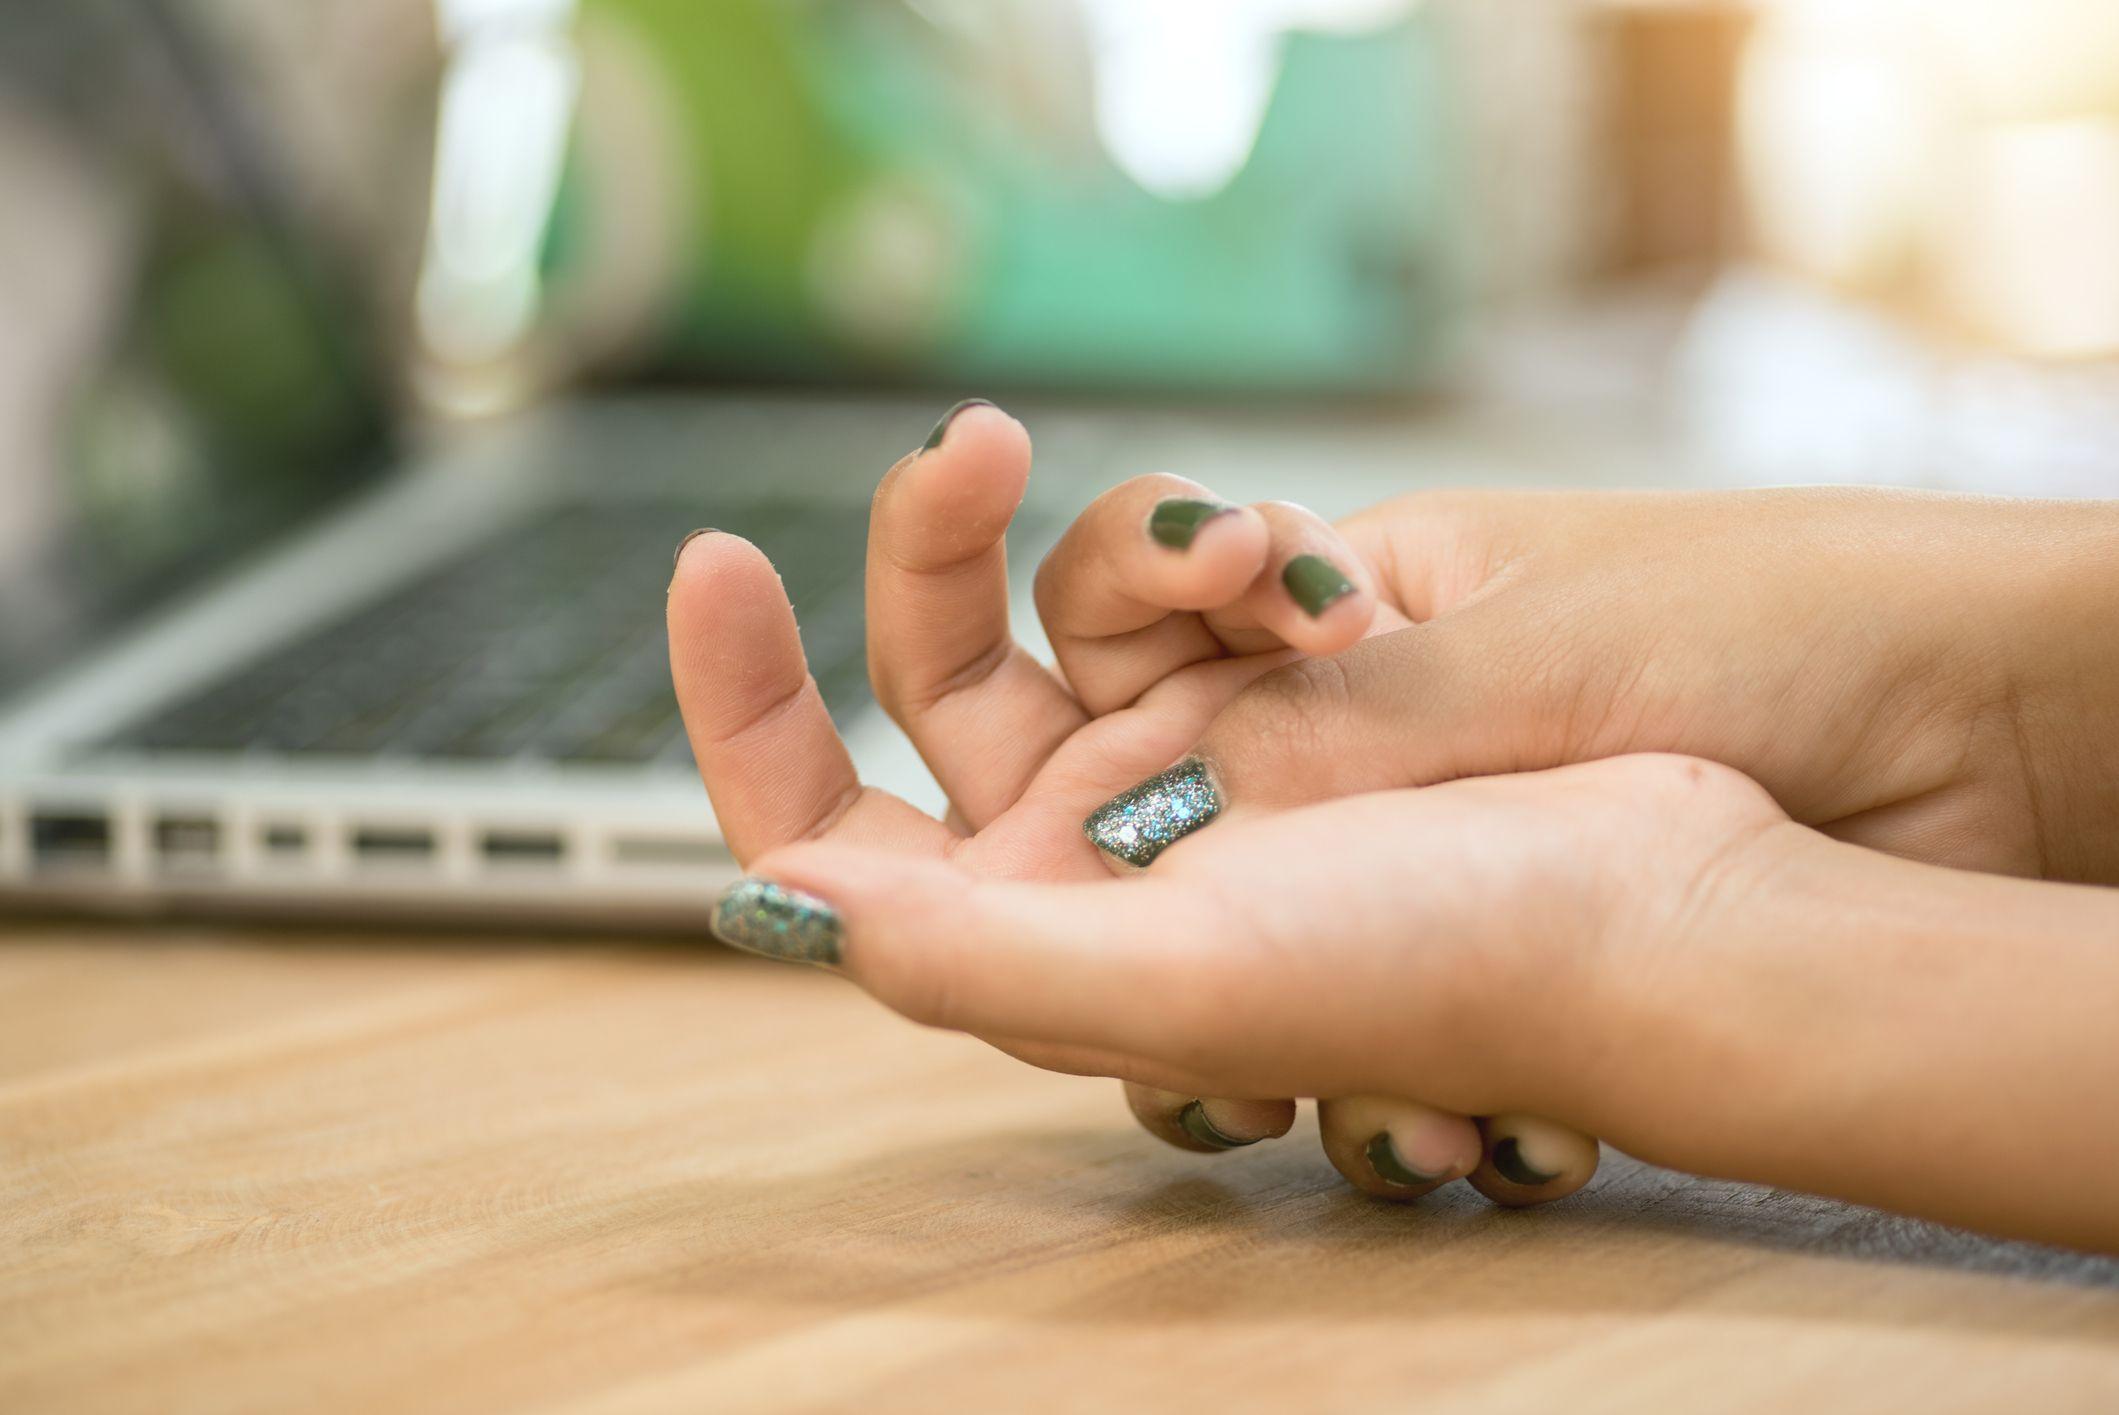 Finger numbness: 6 causes of tingling finger tips